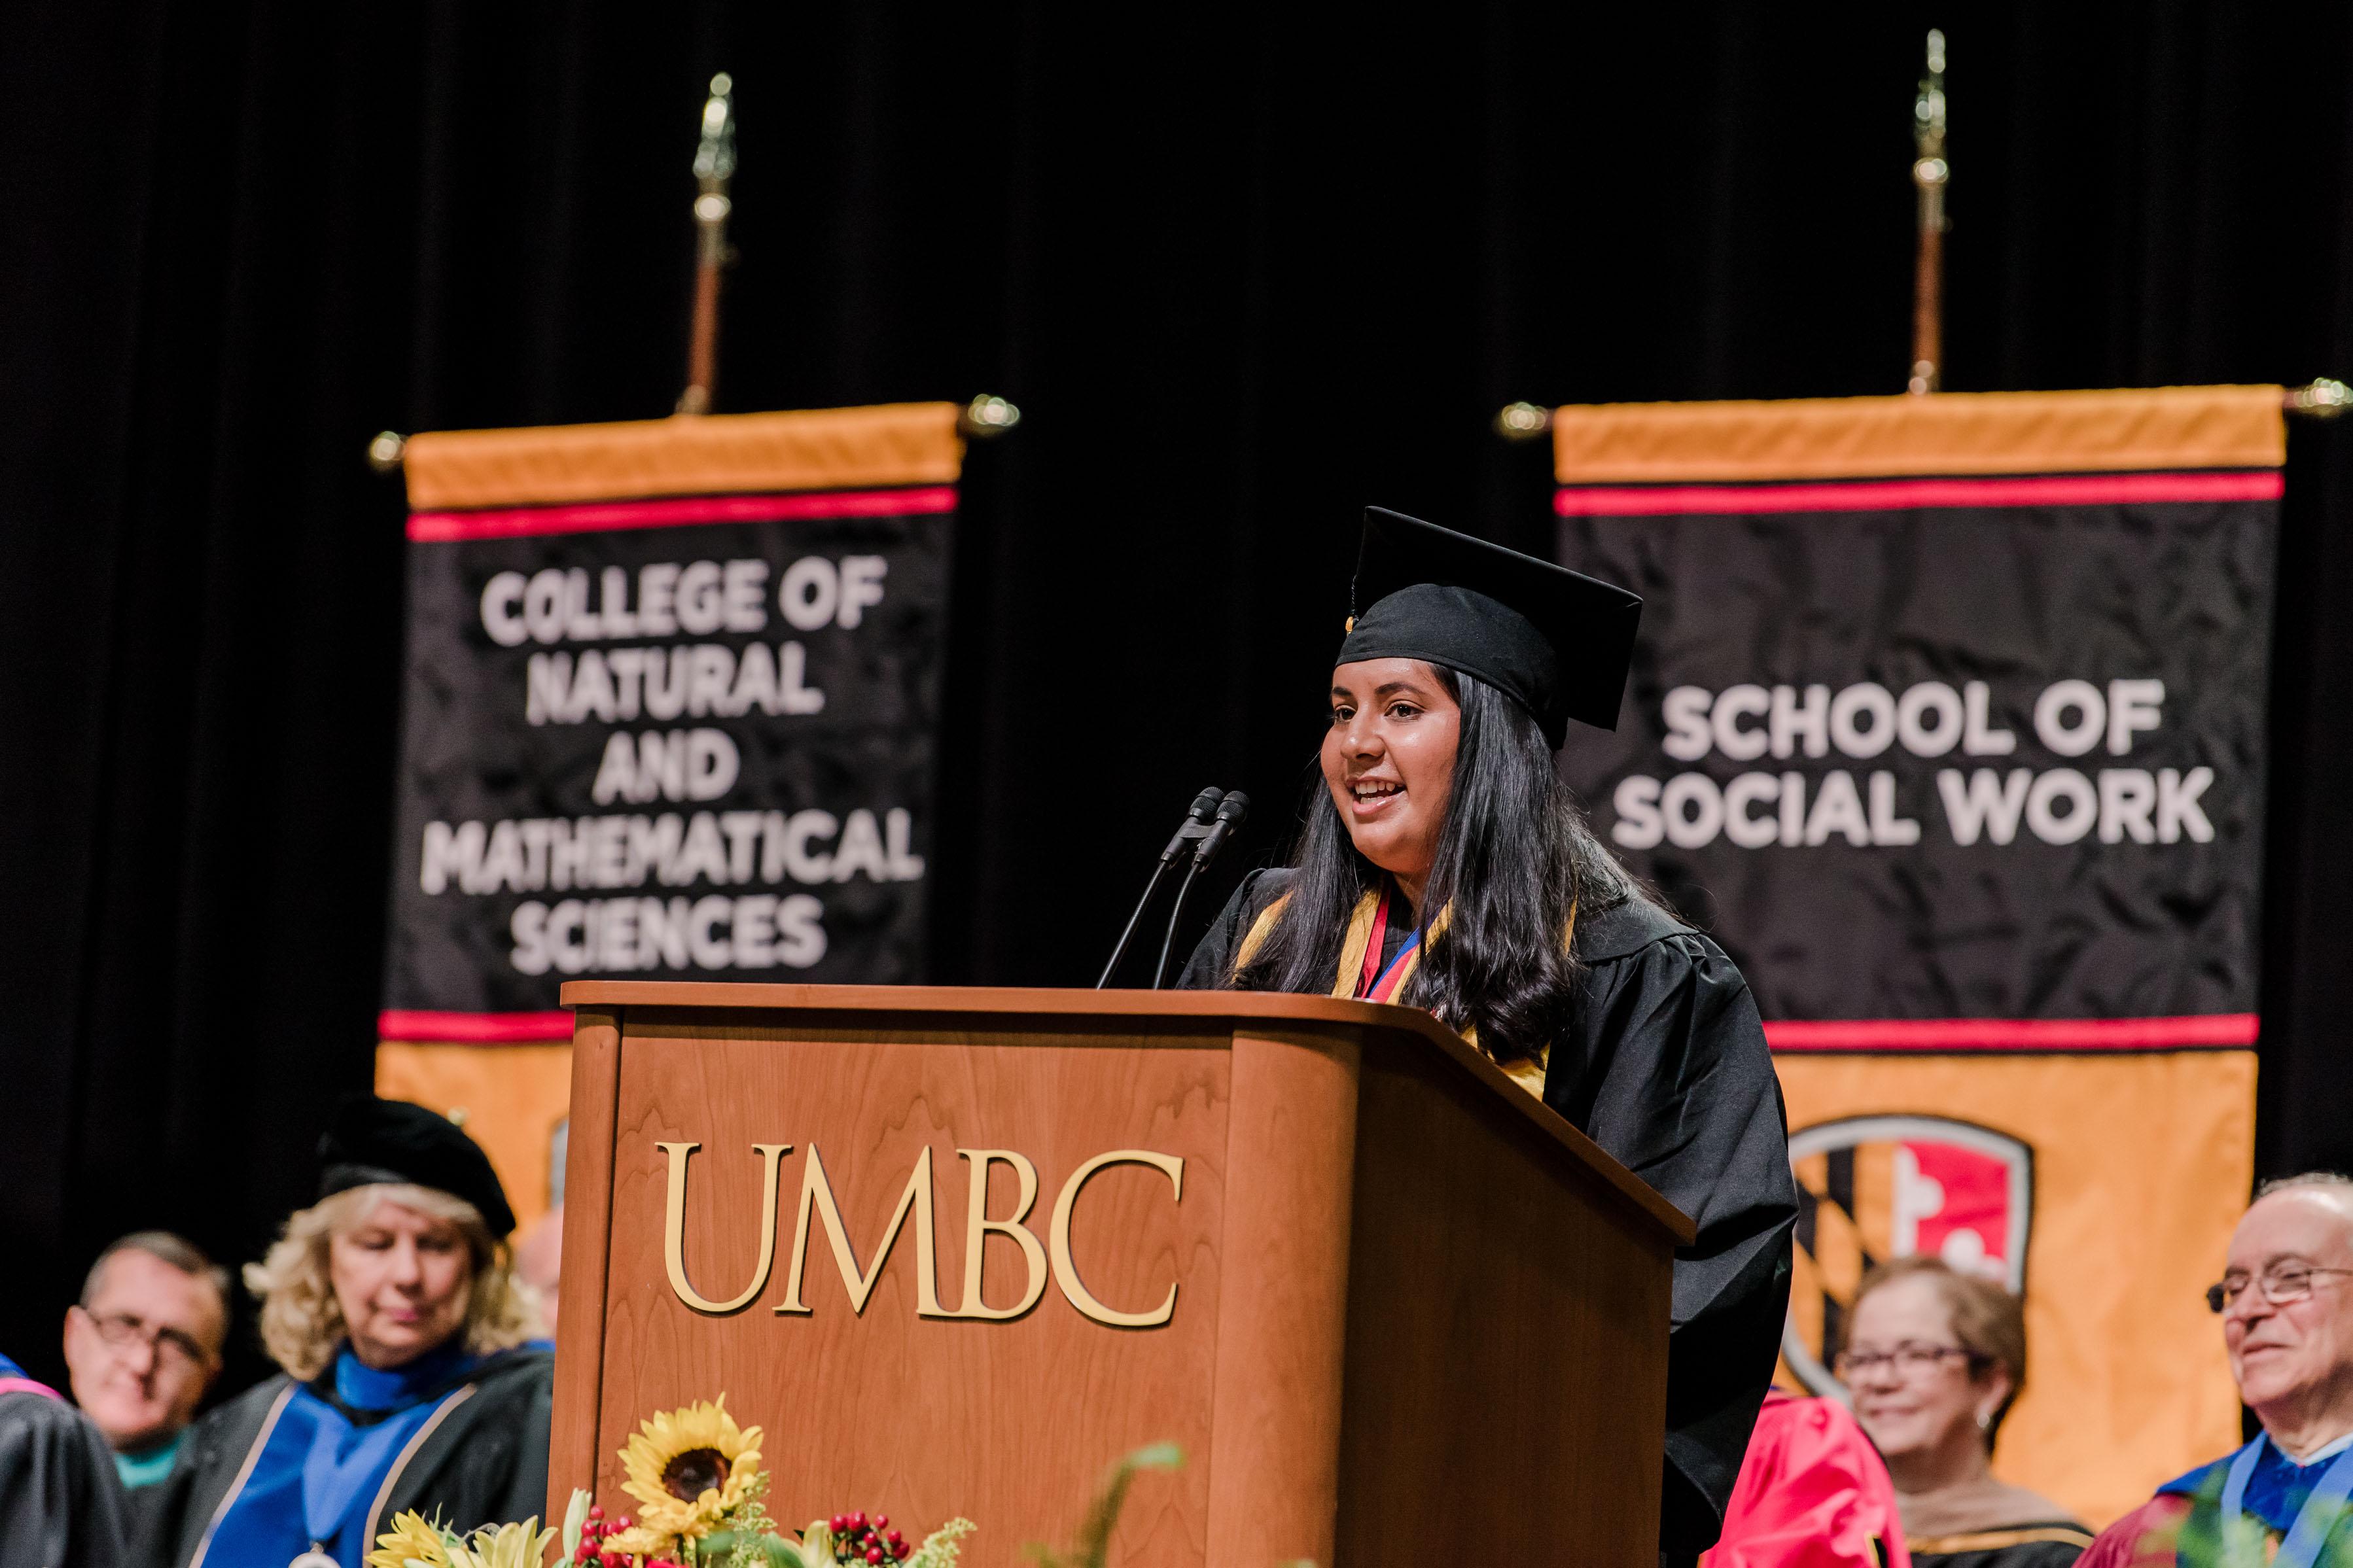 Undergradaute valedictorian Samiksha Manjani addresses her classments at spring commencement 2019.